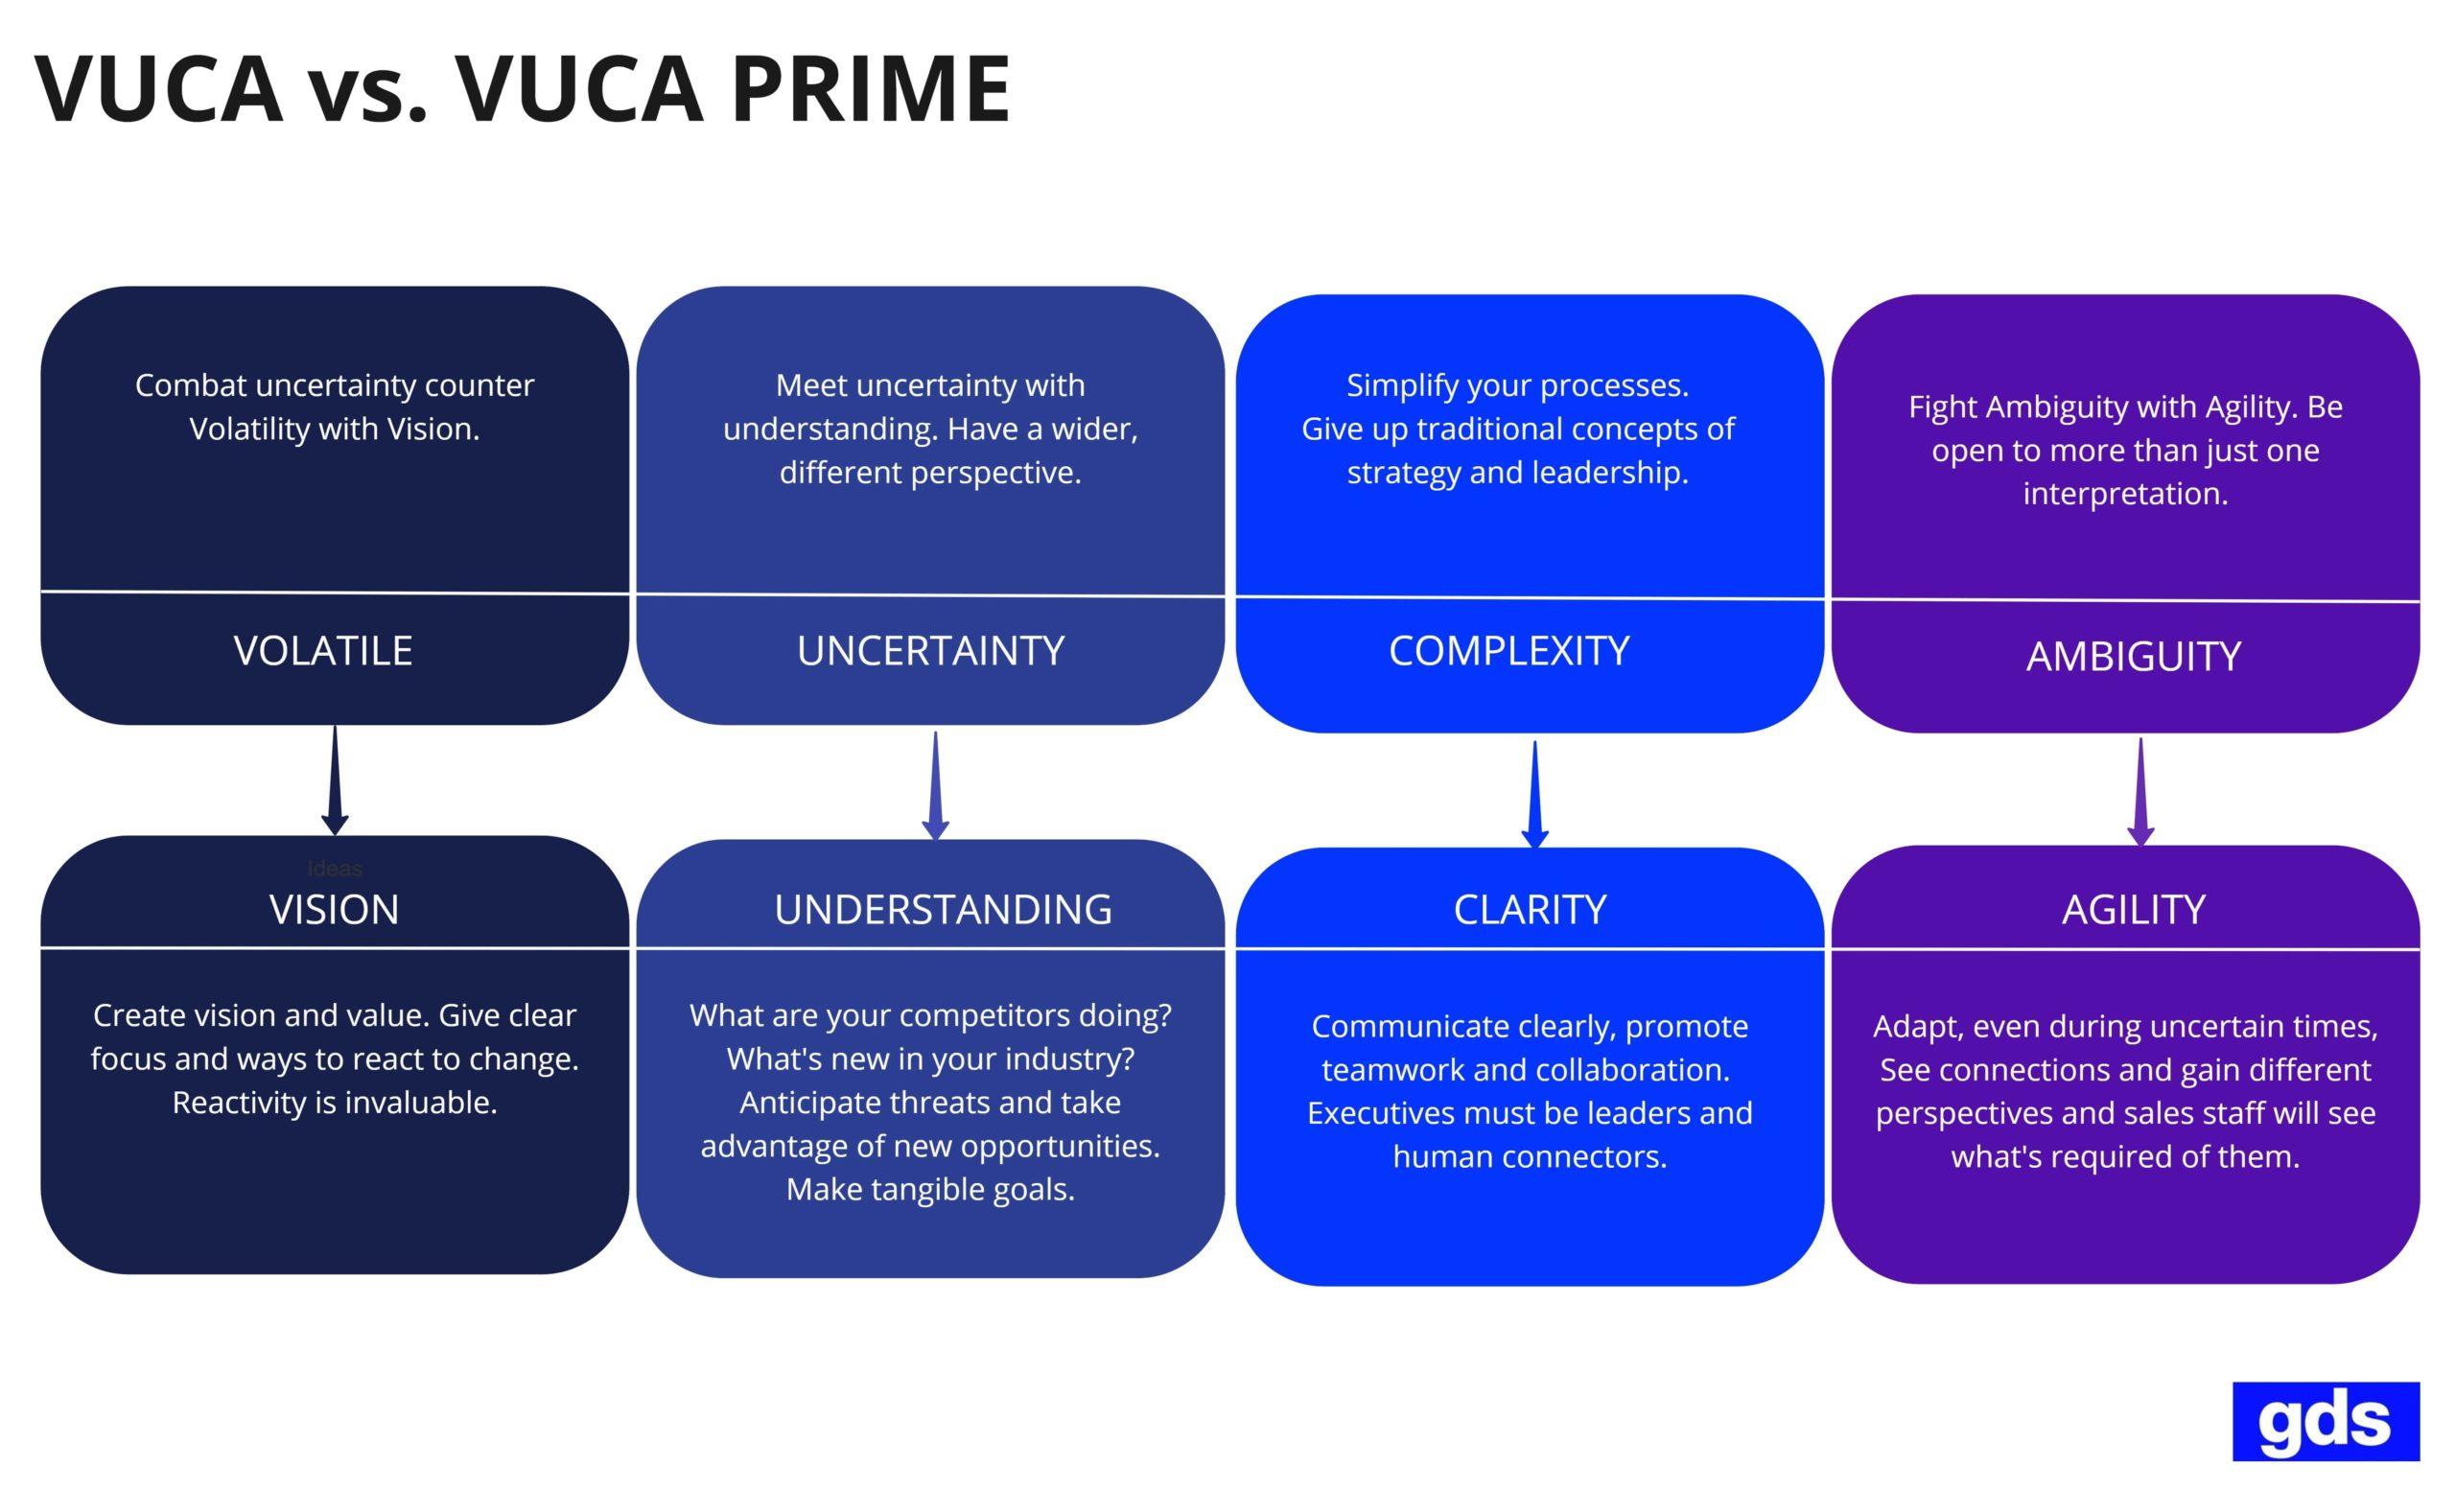 VUCA PRIME Sales Strategy Plan